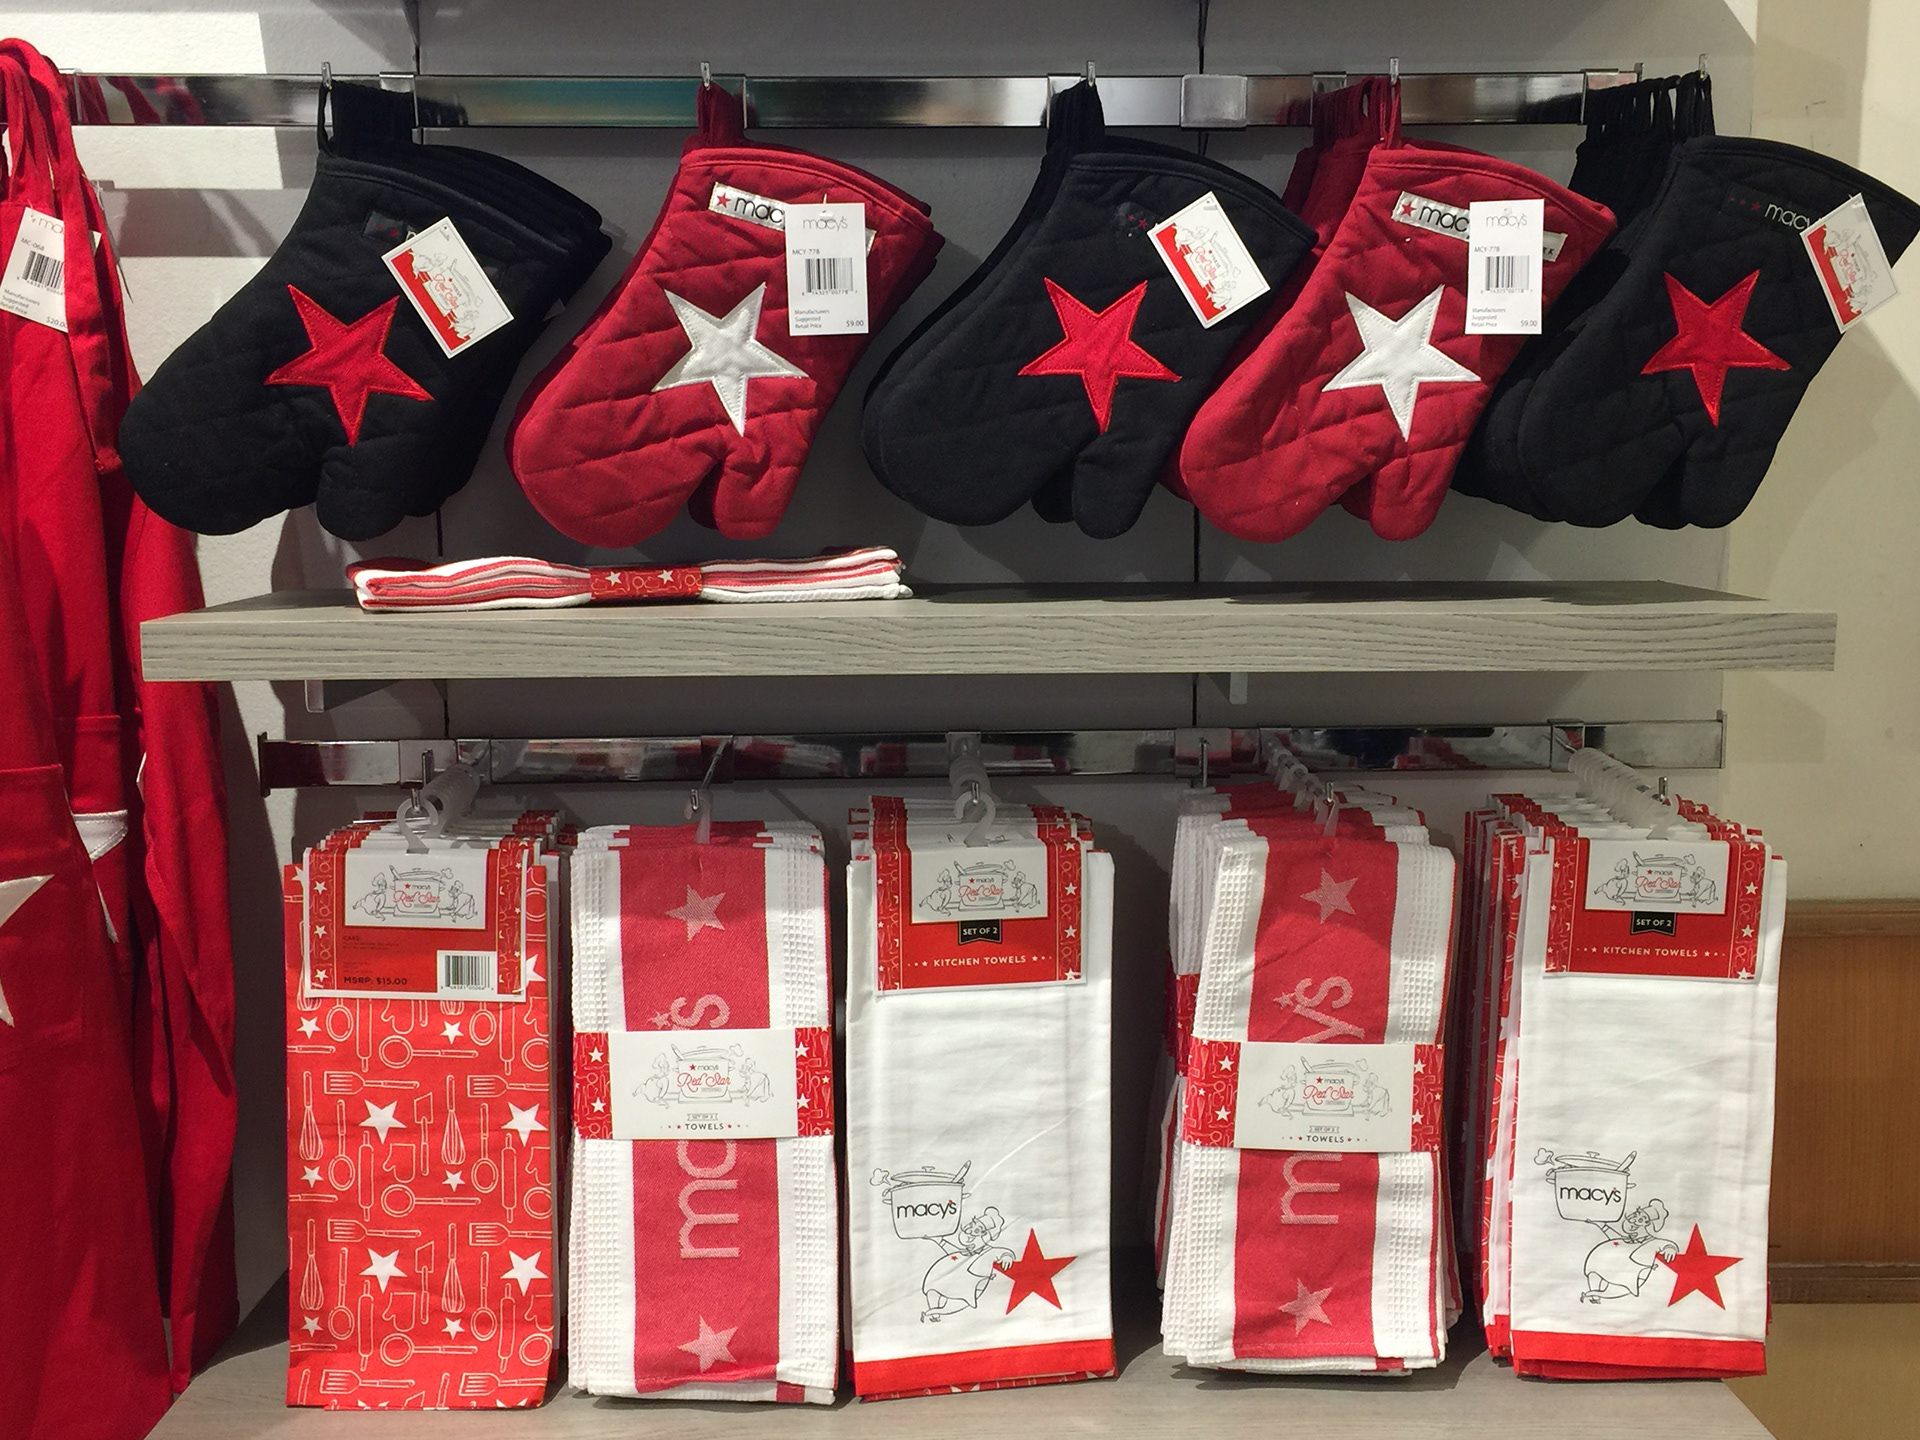 Laura Pavlo Macy S Red Star Kitchen Pop Up Shop